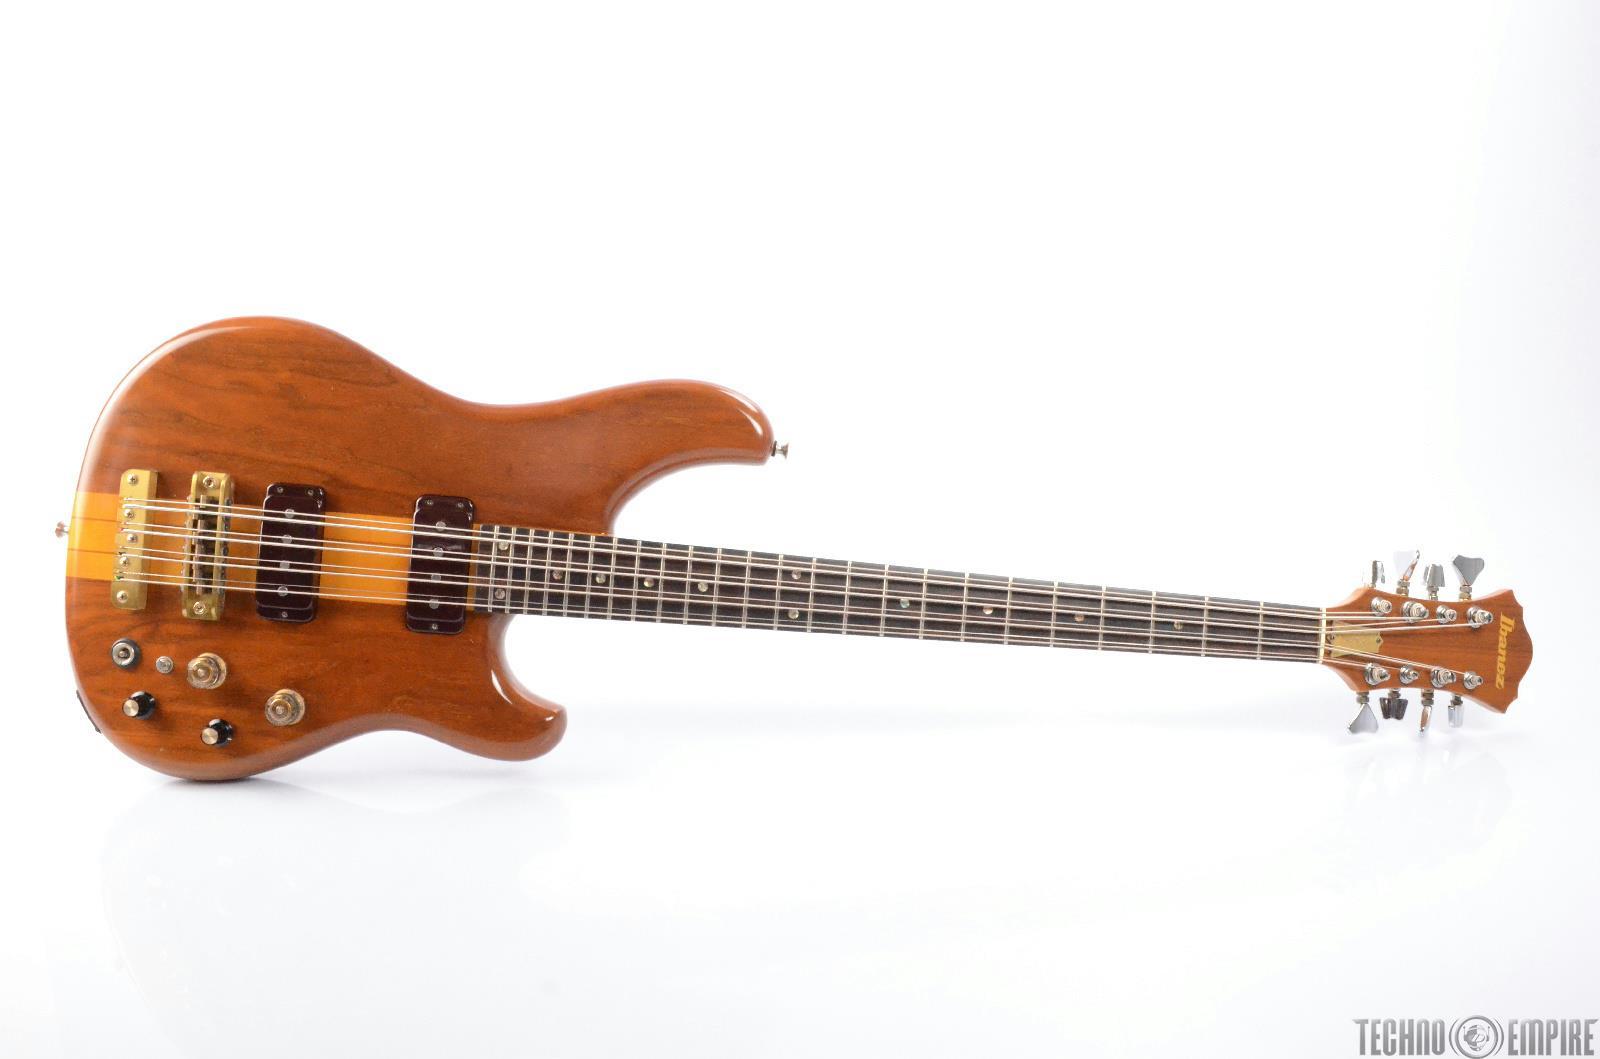 1980 ibanez mc 980 musician 8 string electric bass guitar w hard case 26458 ebay. Black Bedroom Furniture Sets. Home Design Ideas